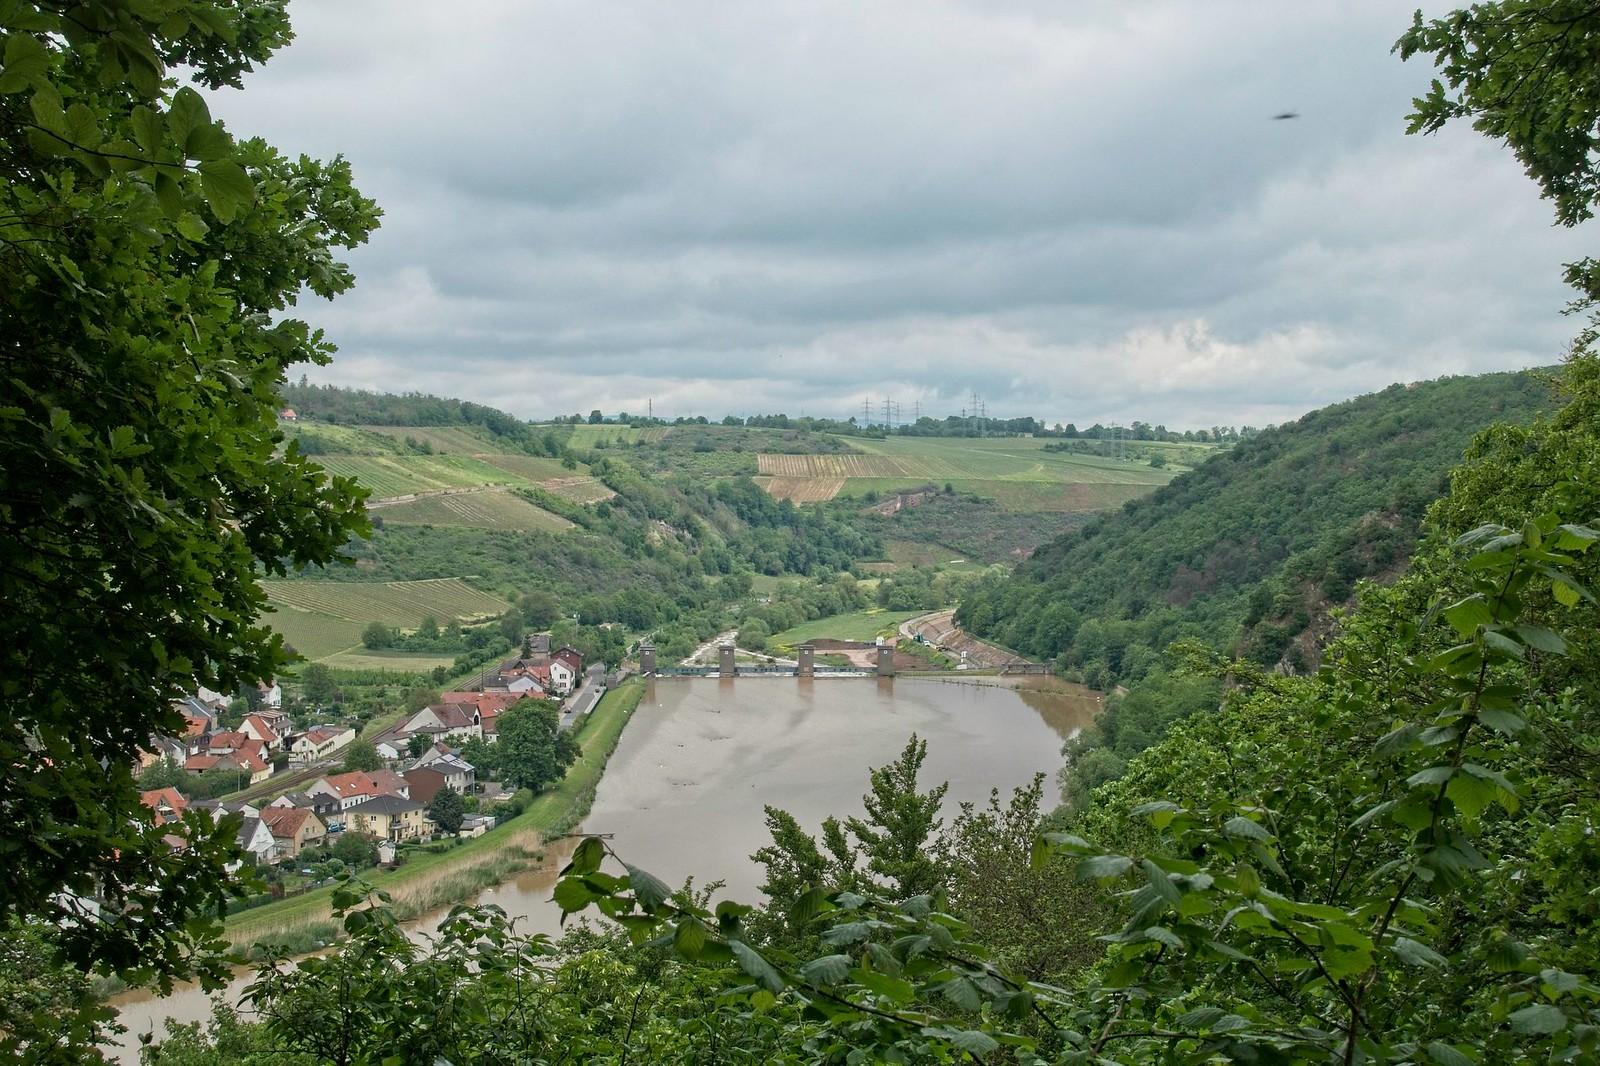 Blick auf Staustufe bei Niederhausen - Vitaltour Geheimnisvoller Lemberg